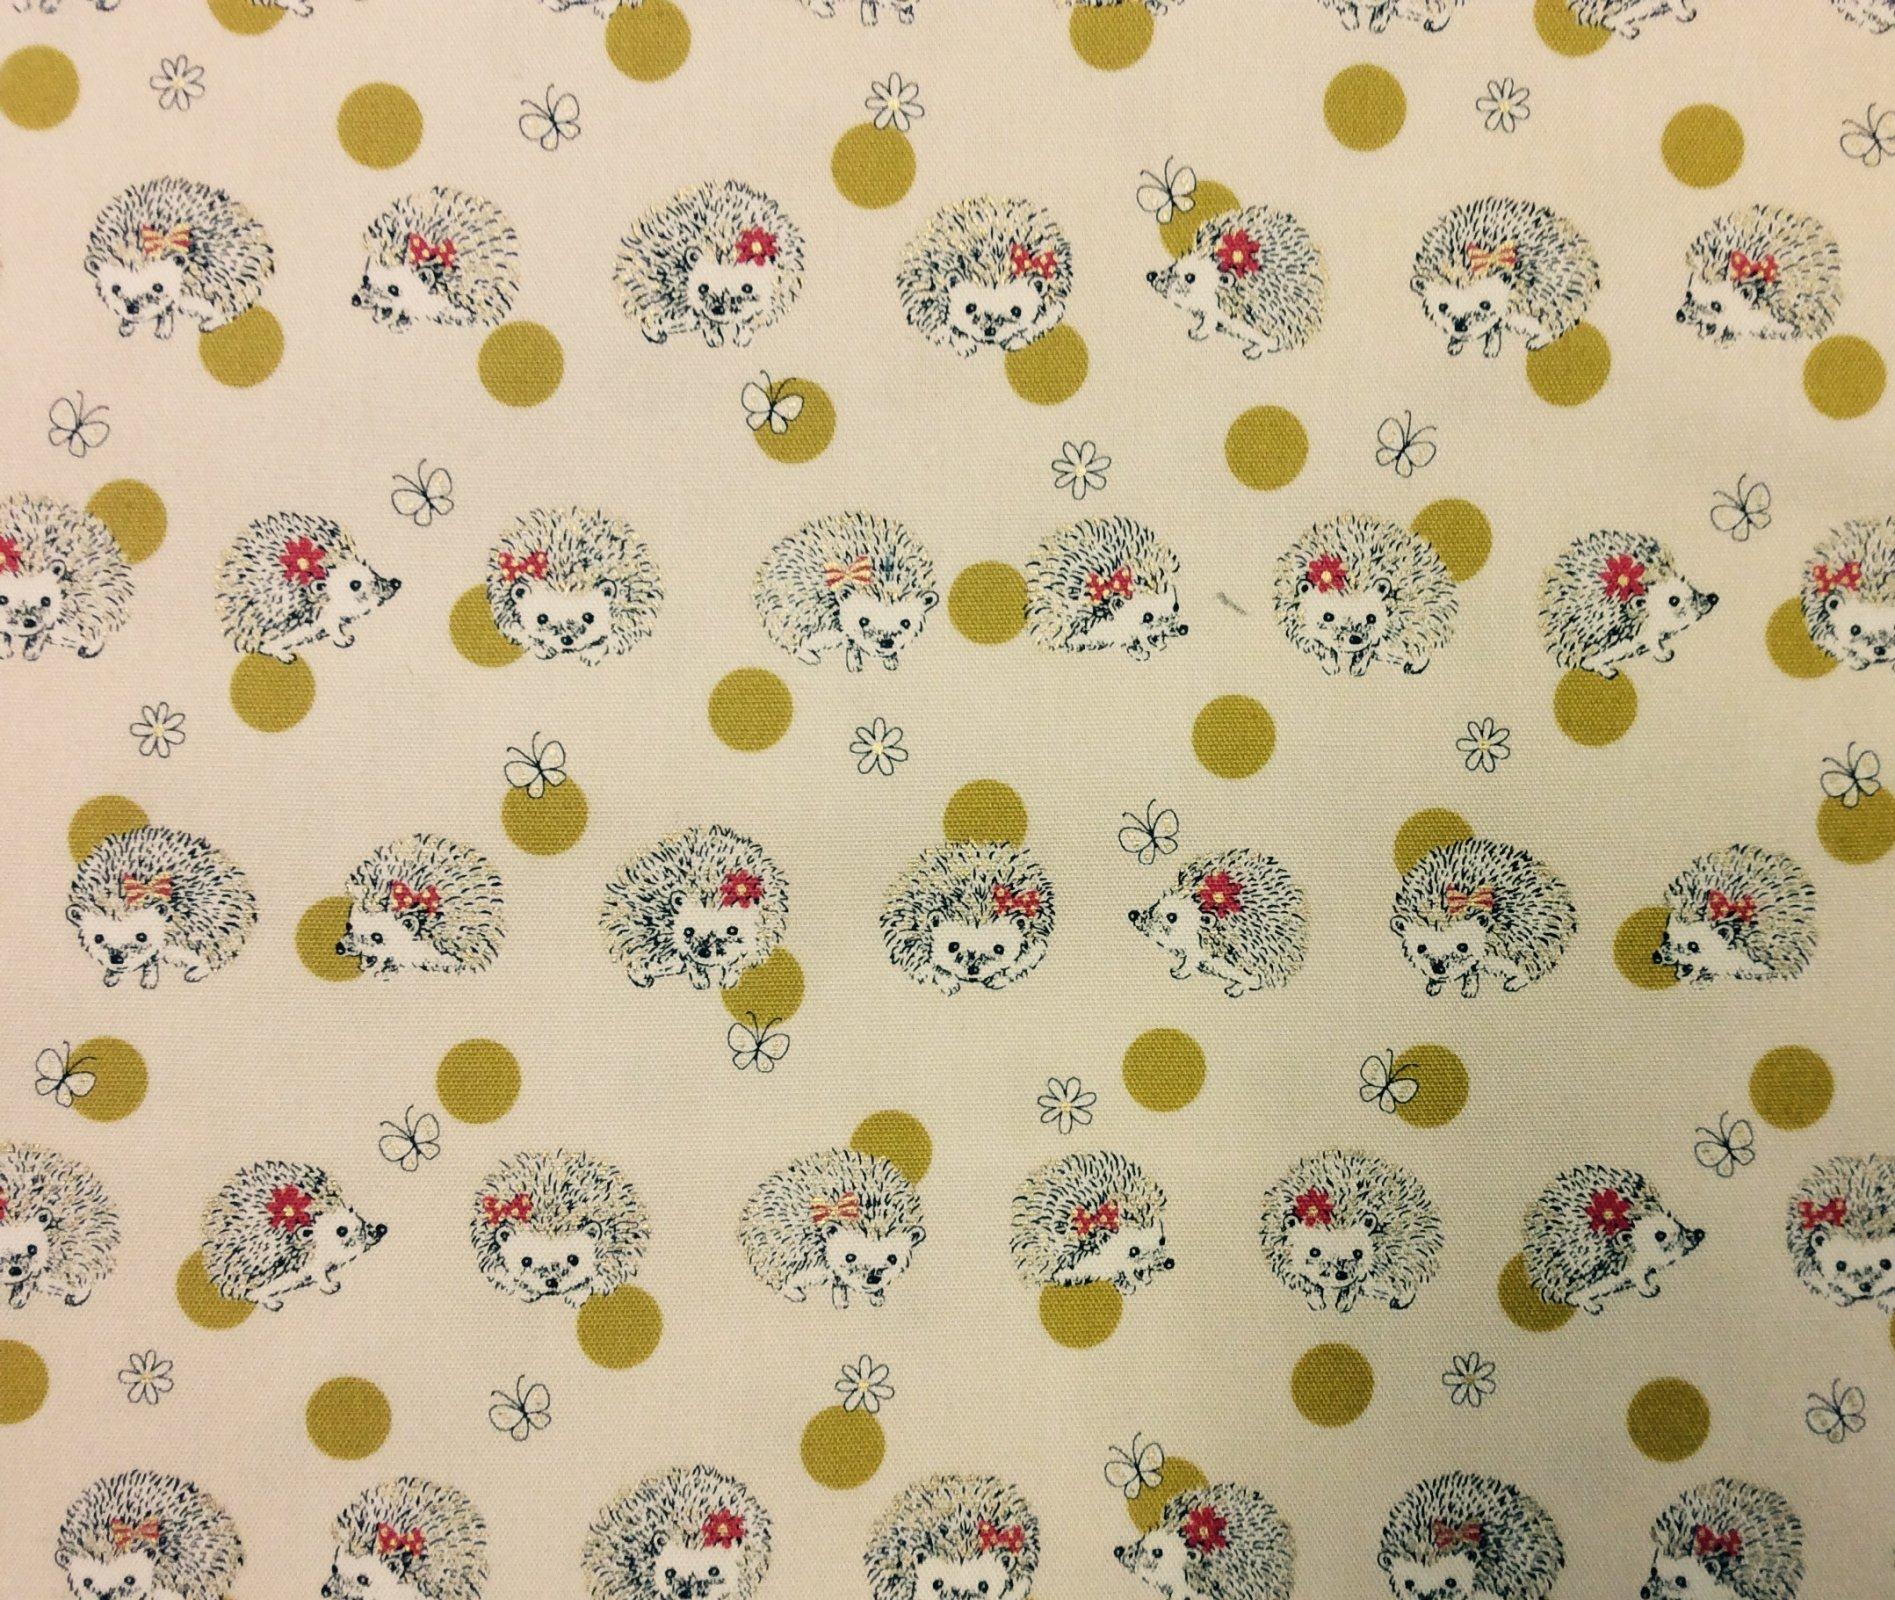 Hedgehog Cute Animals Kokka Japan Cotton Canvas Fabric SK53